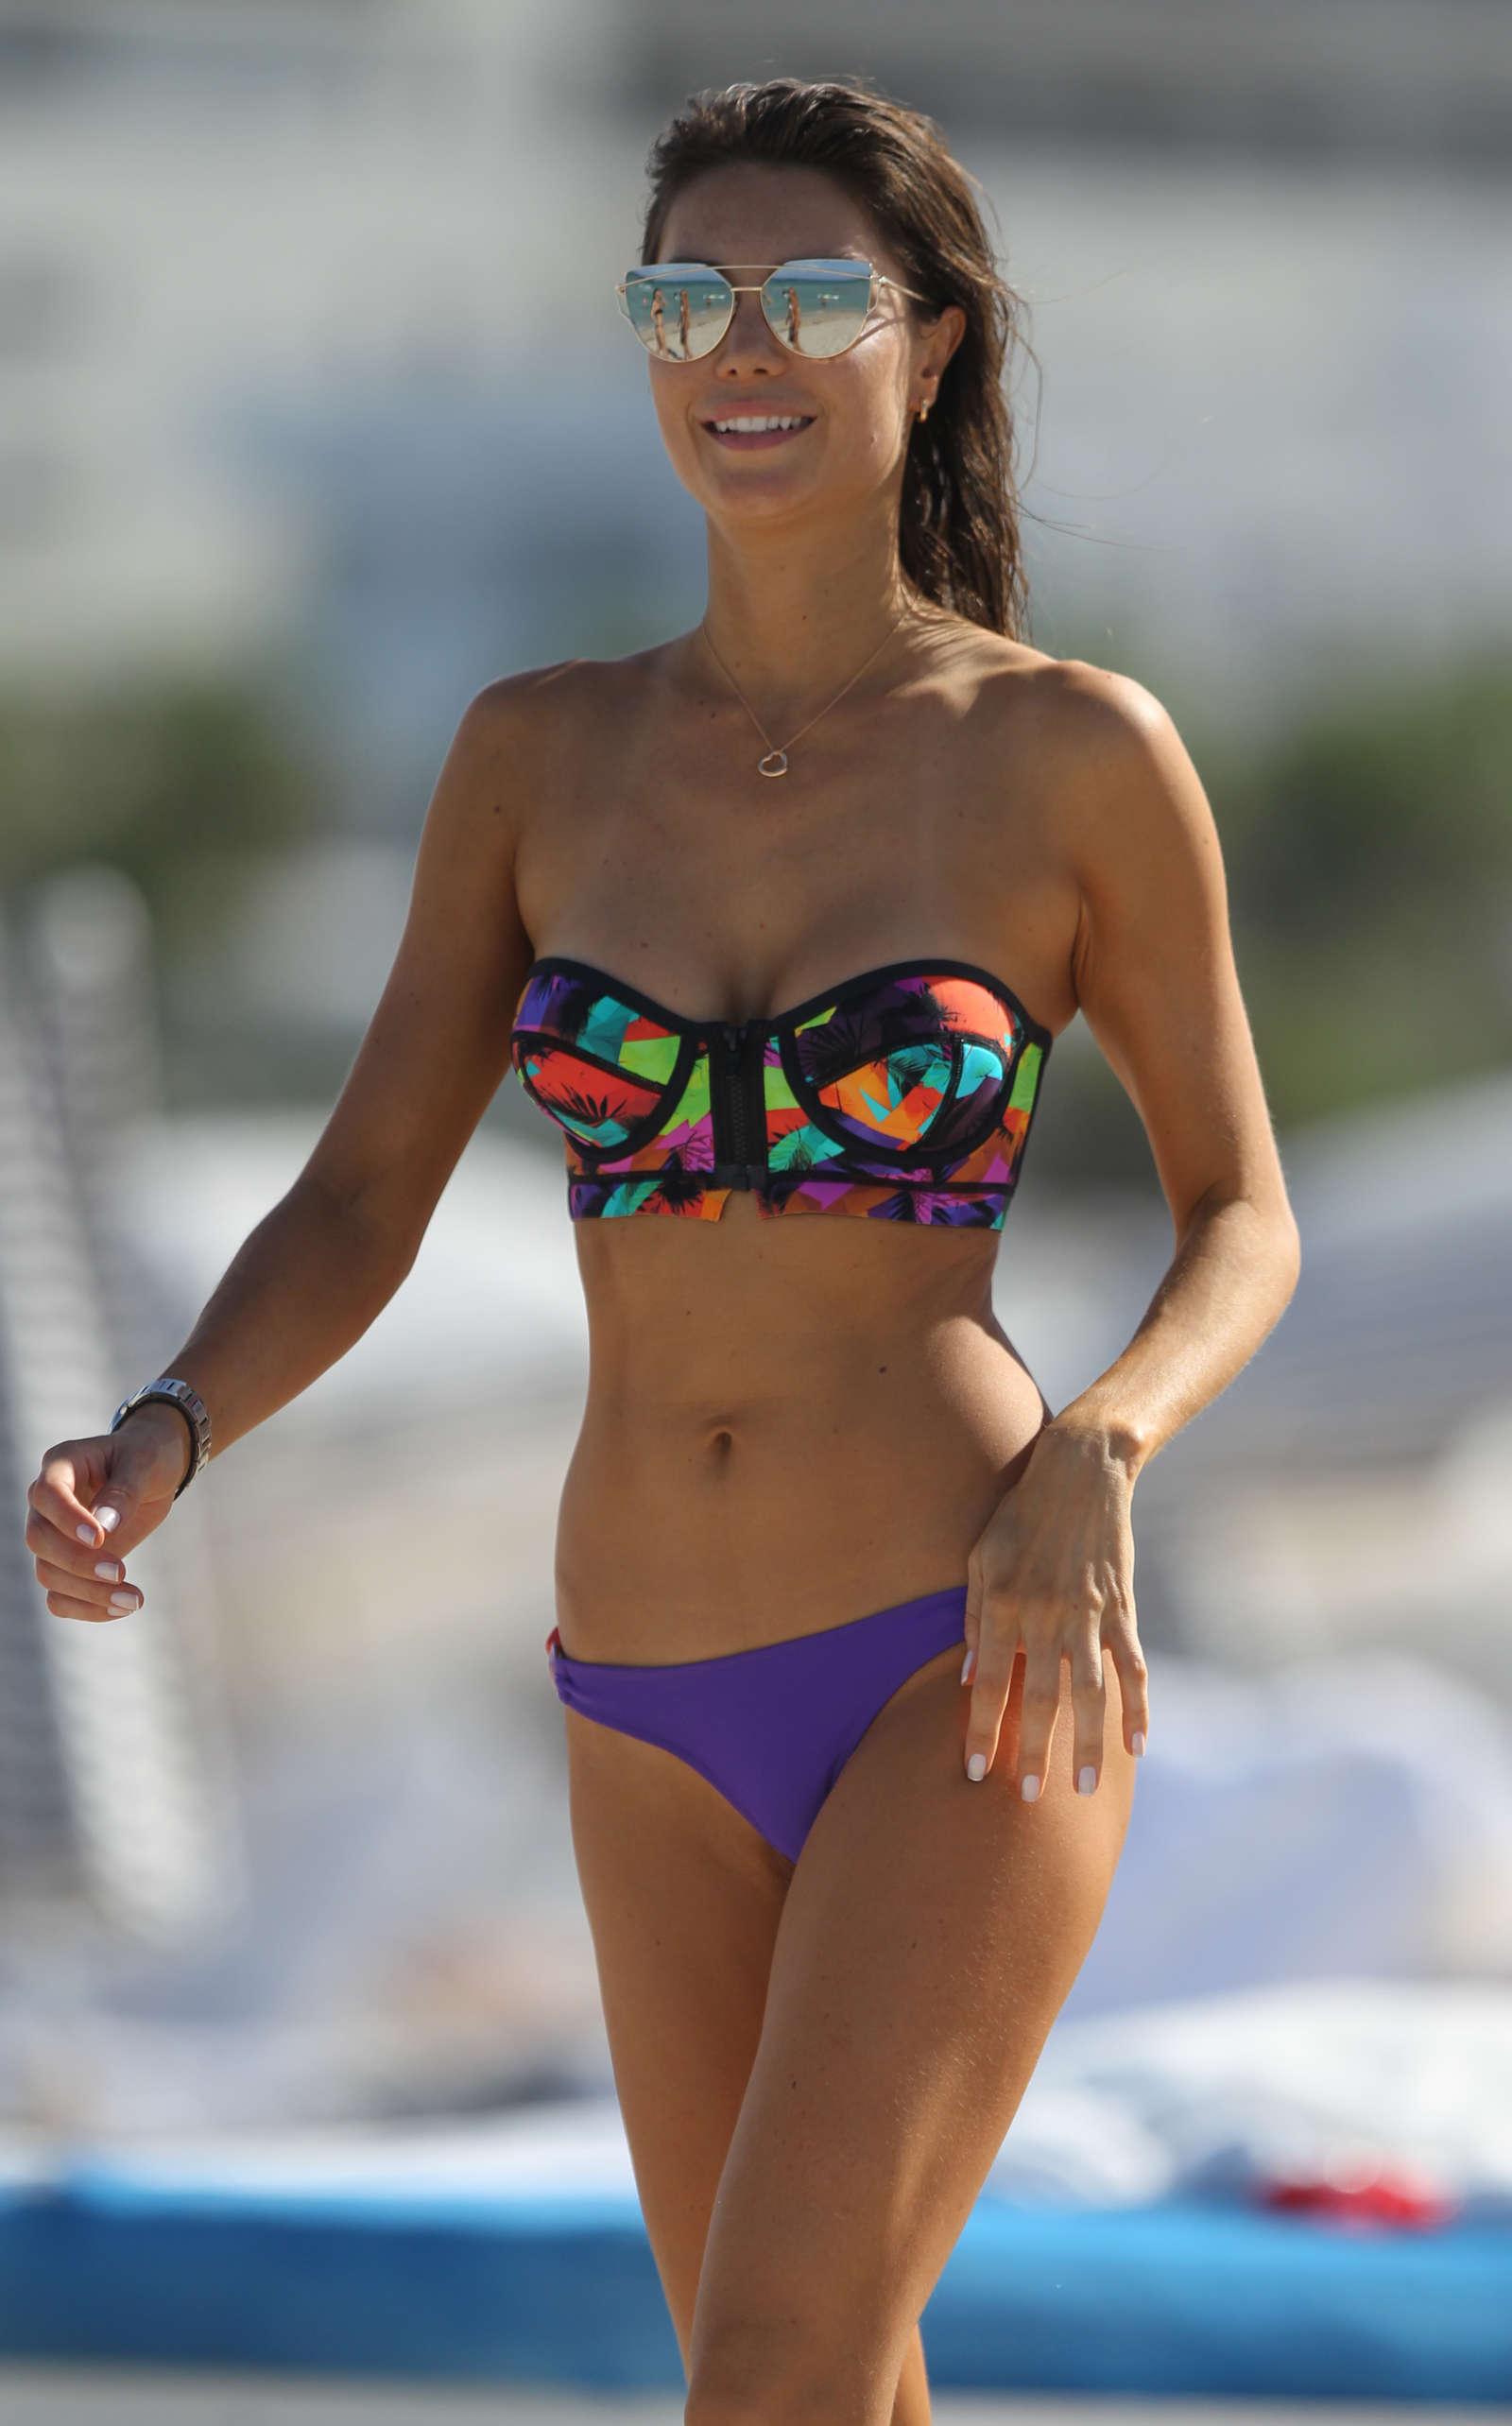 pictures-julia-in-bikini-milf-mirror-pictures